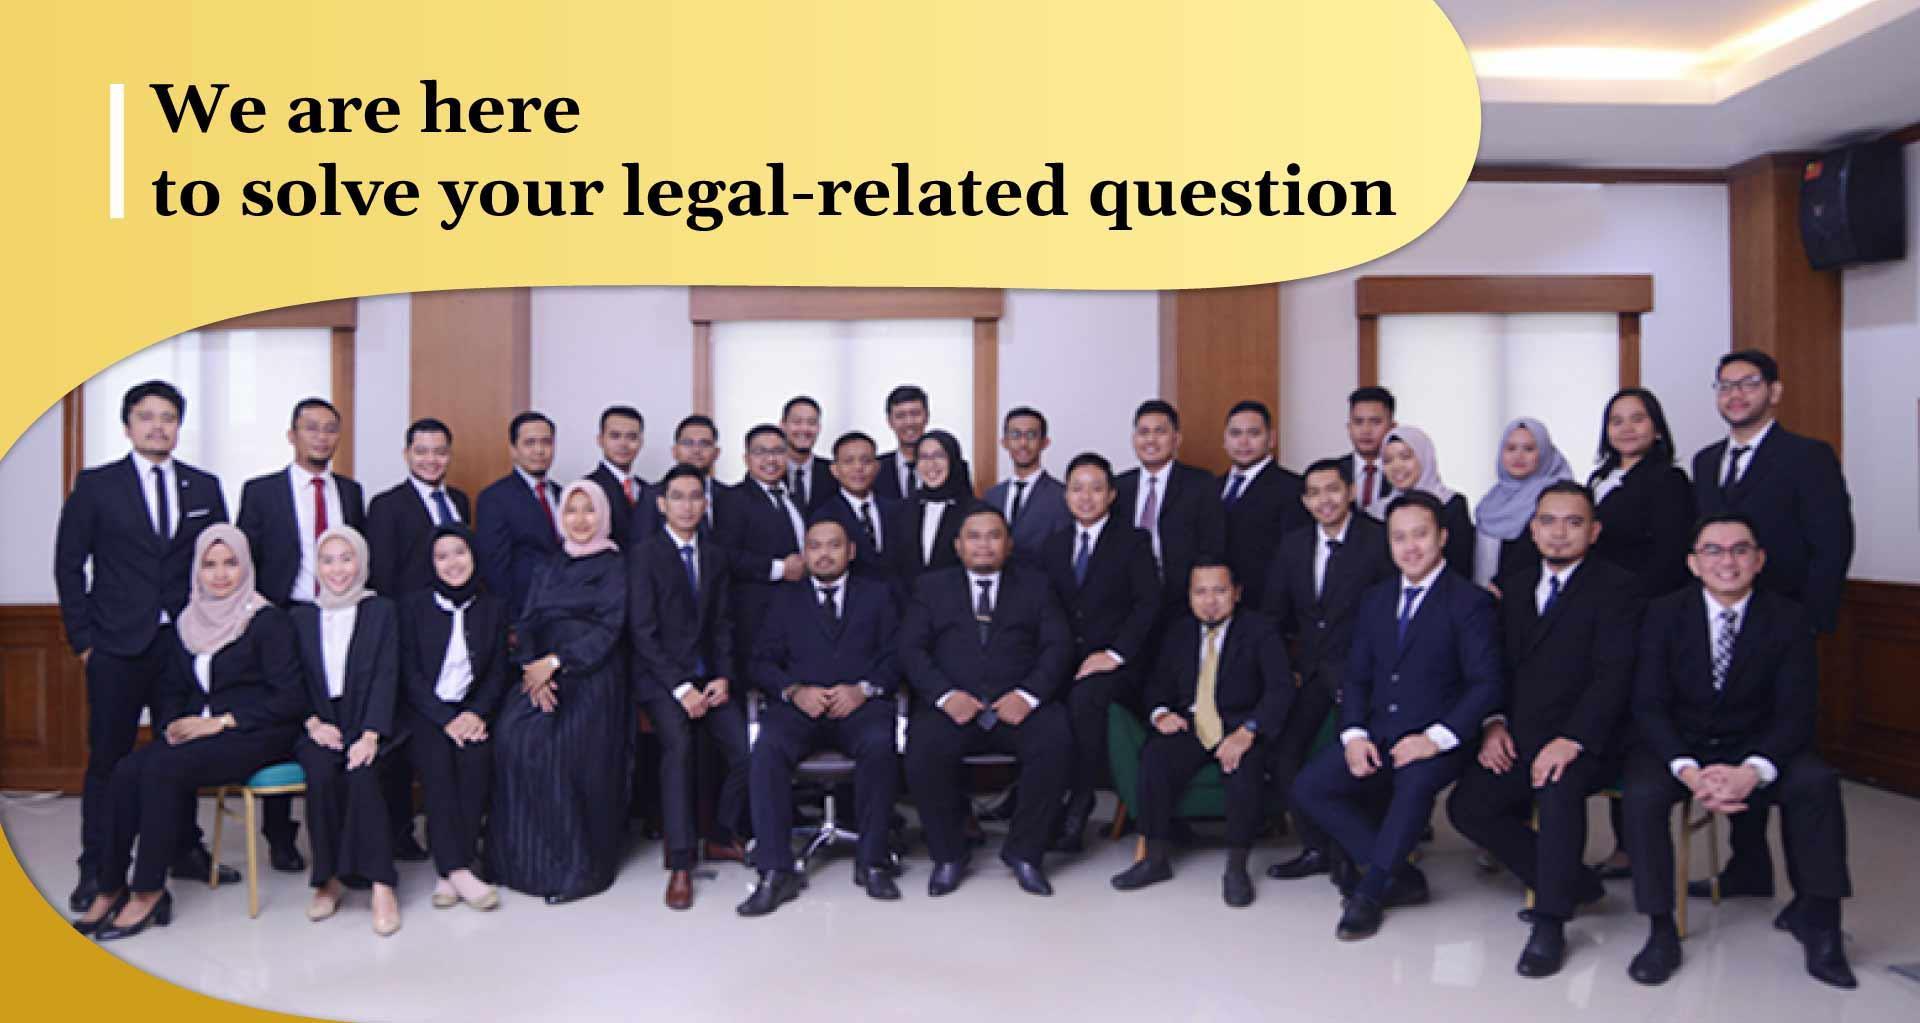 lawyer-sip-lawfirm